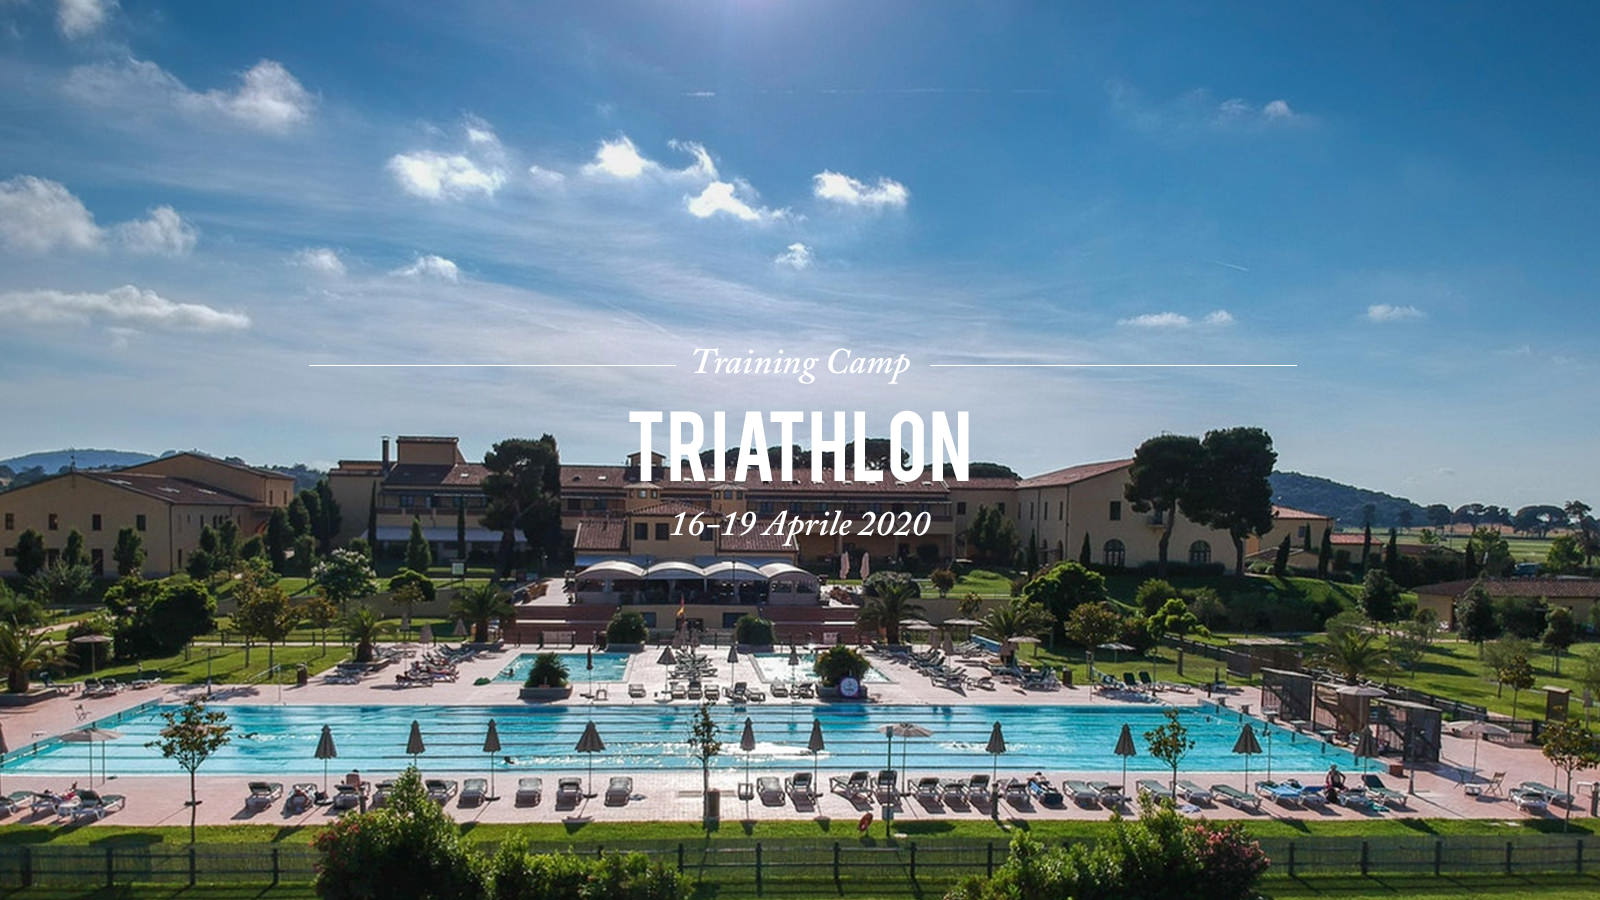 Training Camp Triathlon 2020